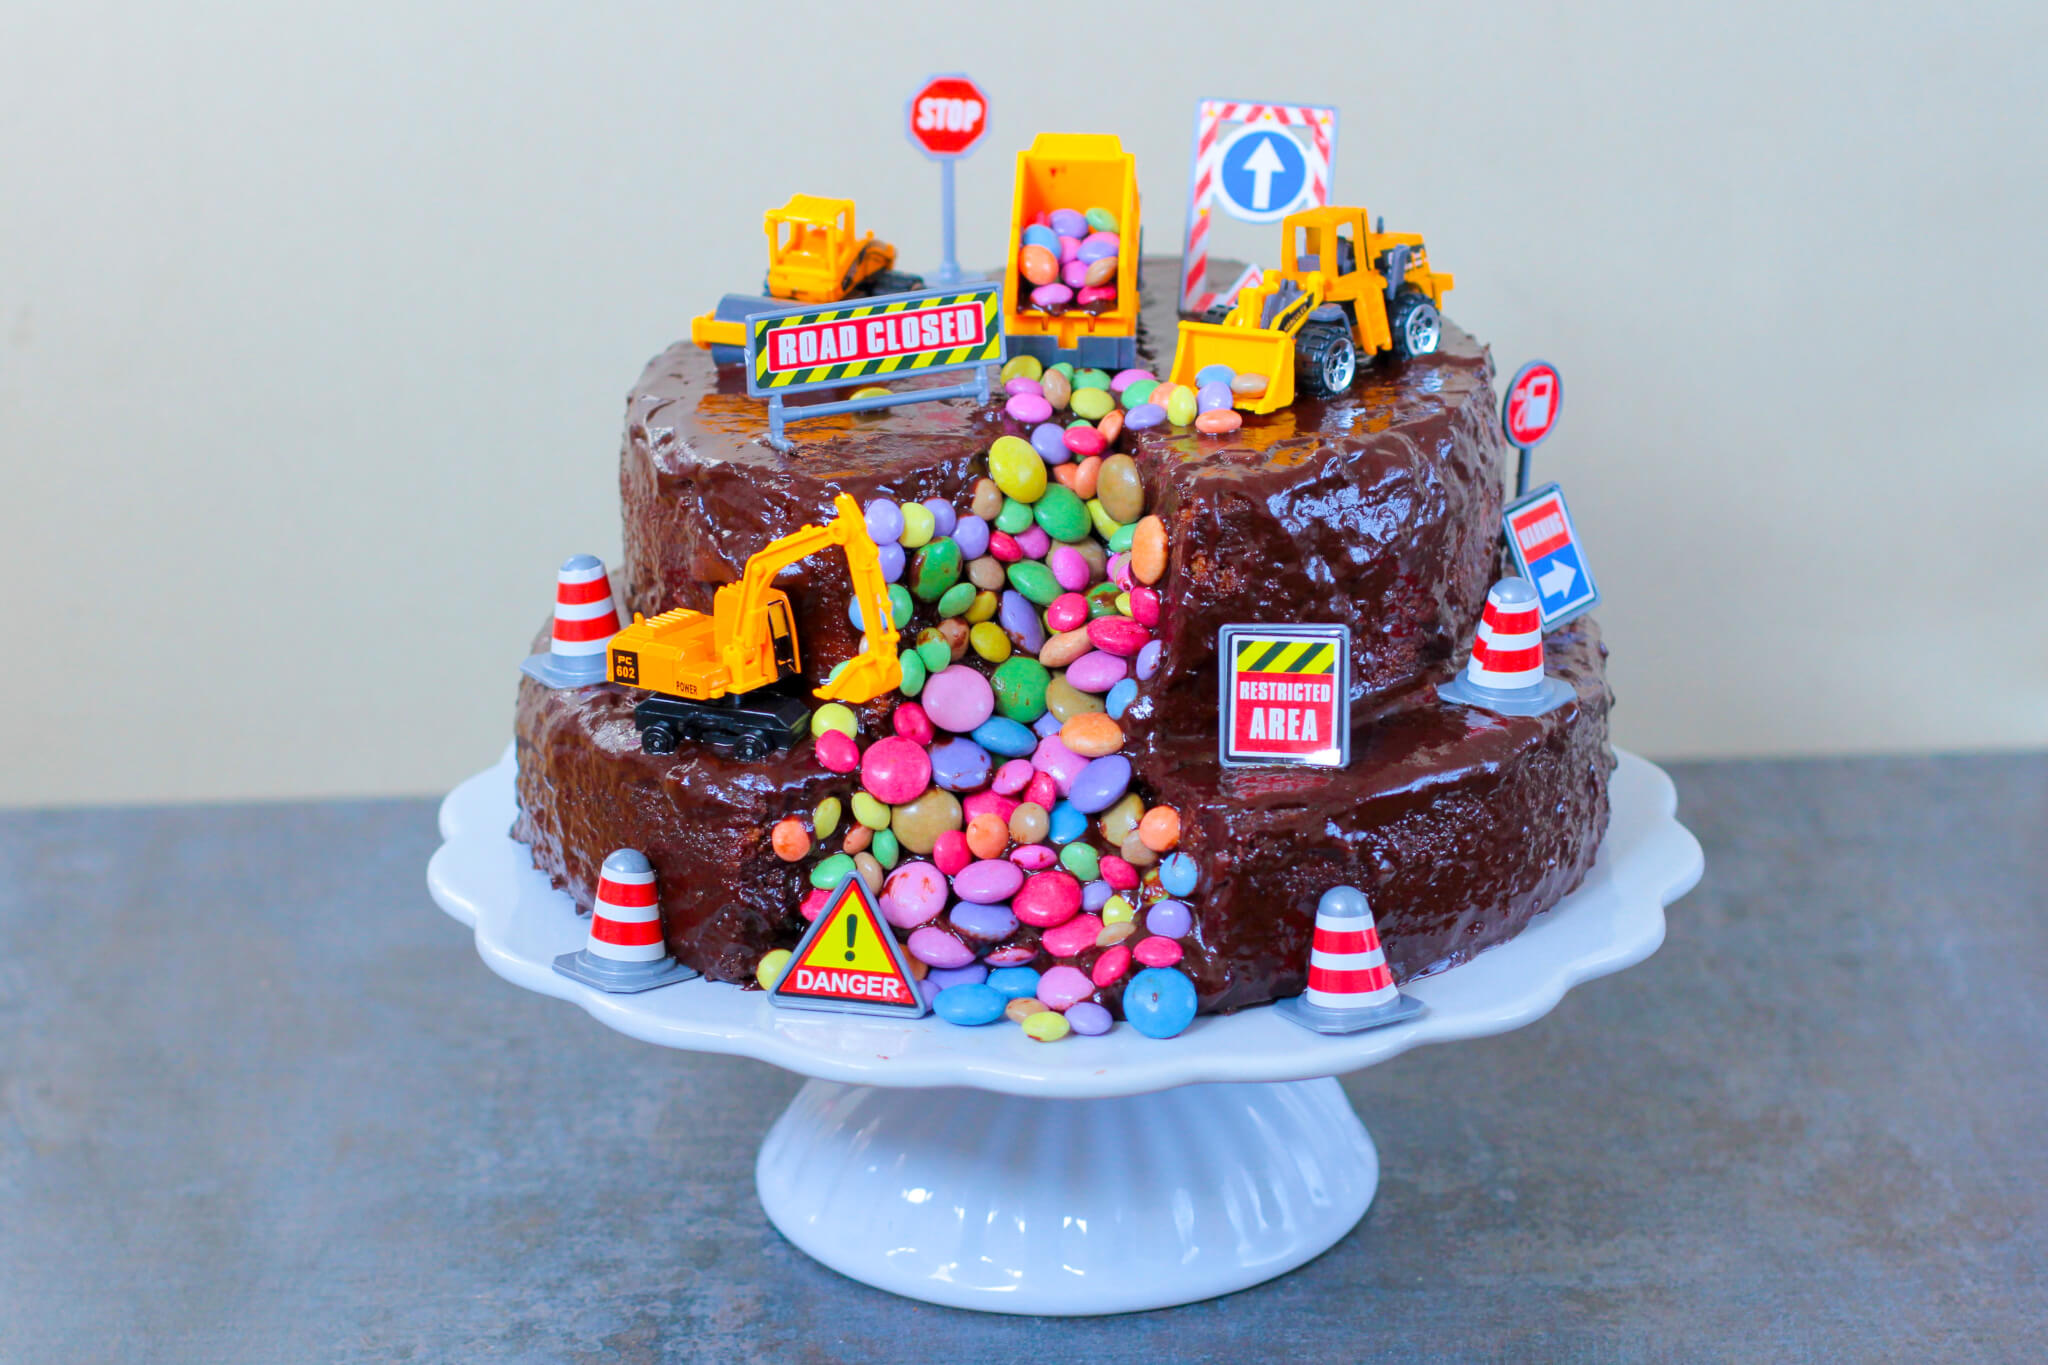 Bagger Kuchen | Digger Cake